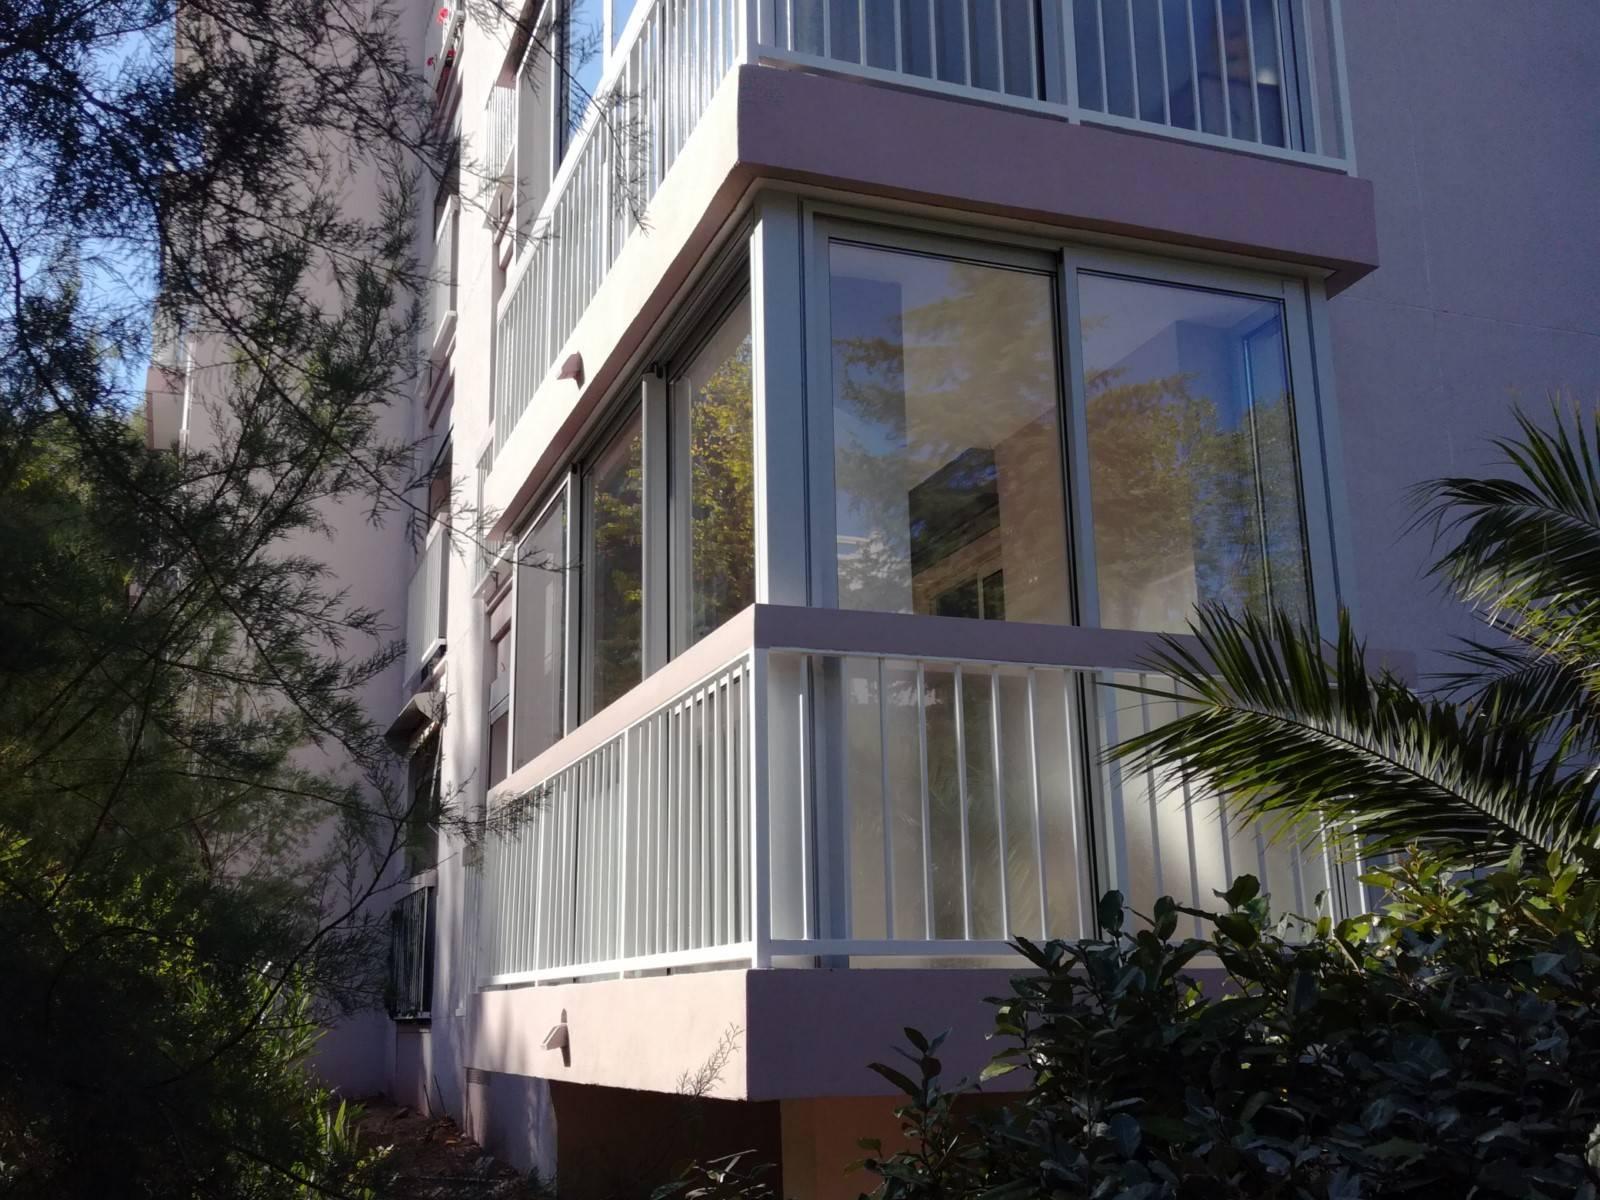 installation de deux fermetures de balcon en aluminium ollioules installation et r novation. Black Bedroom Furniture Sets. Home Design Ideas